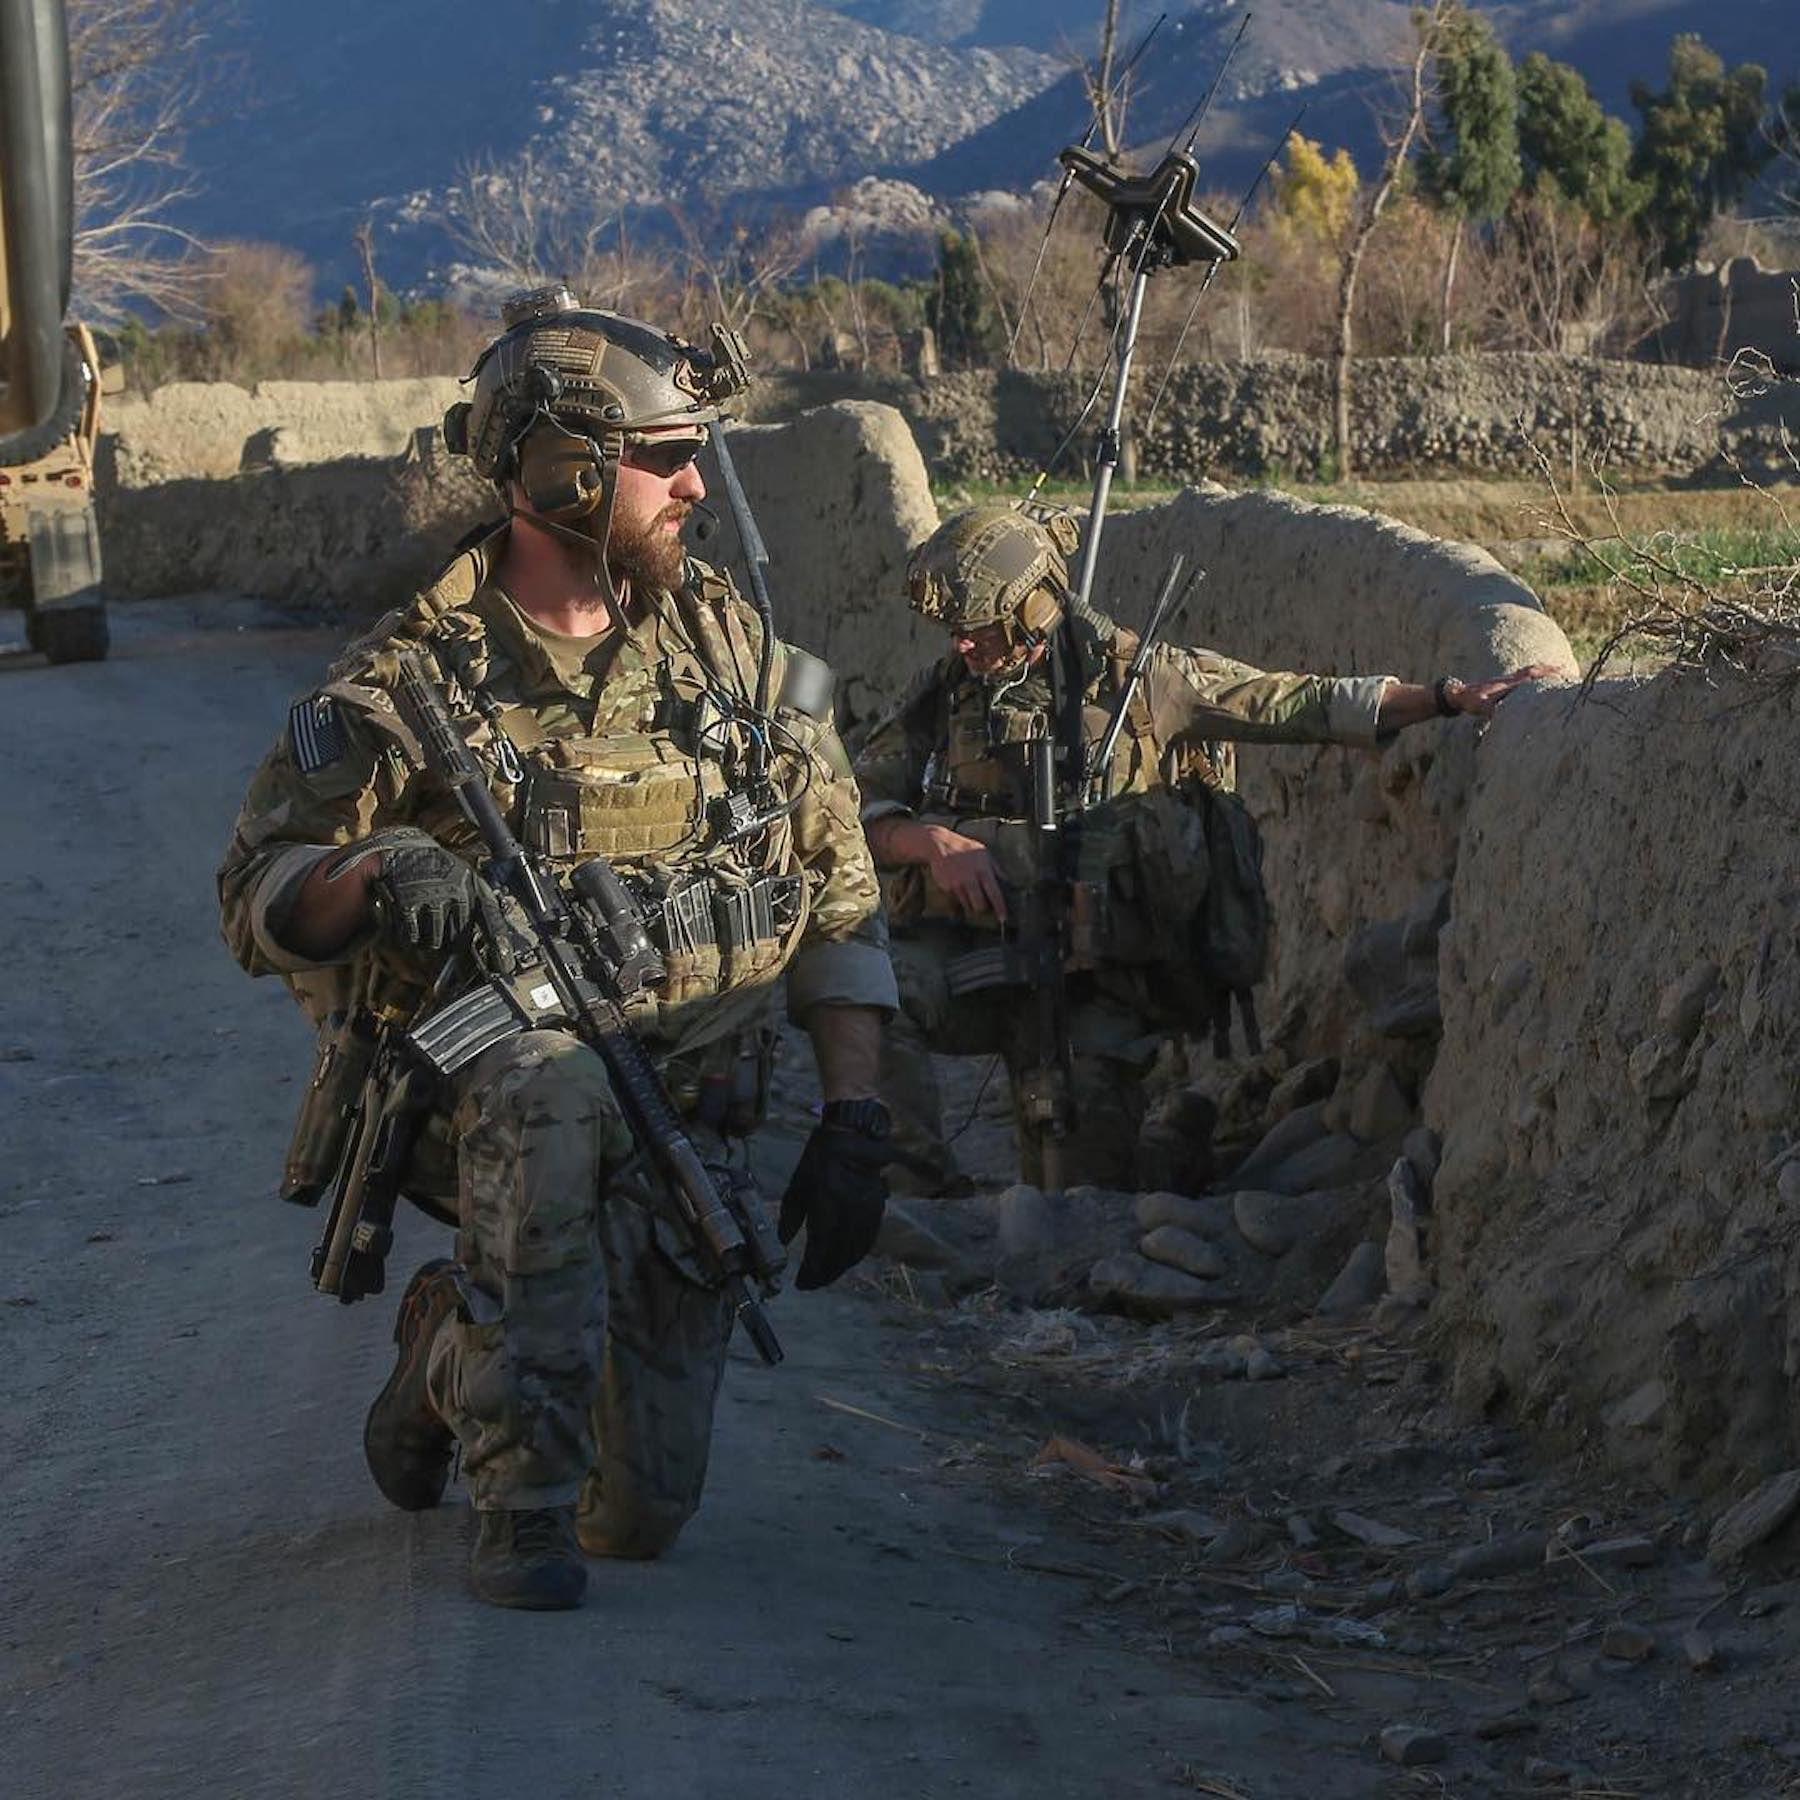 US commandos